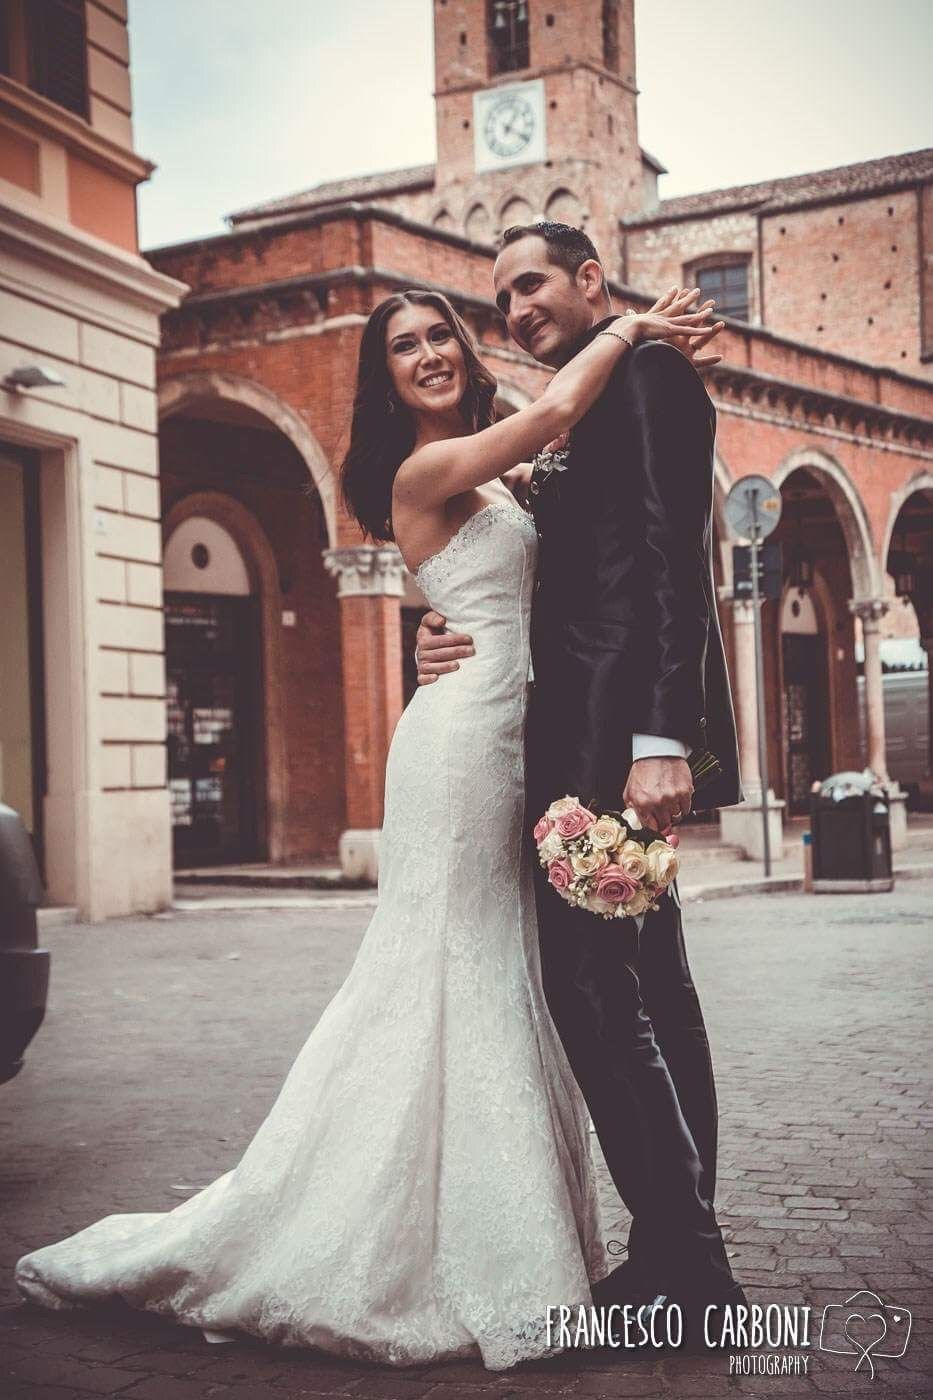 International wedding photographer in rome francesco carboni roma